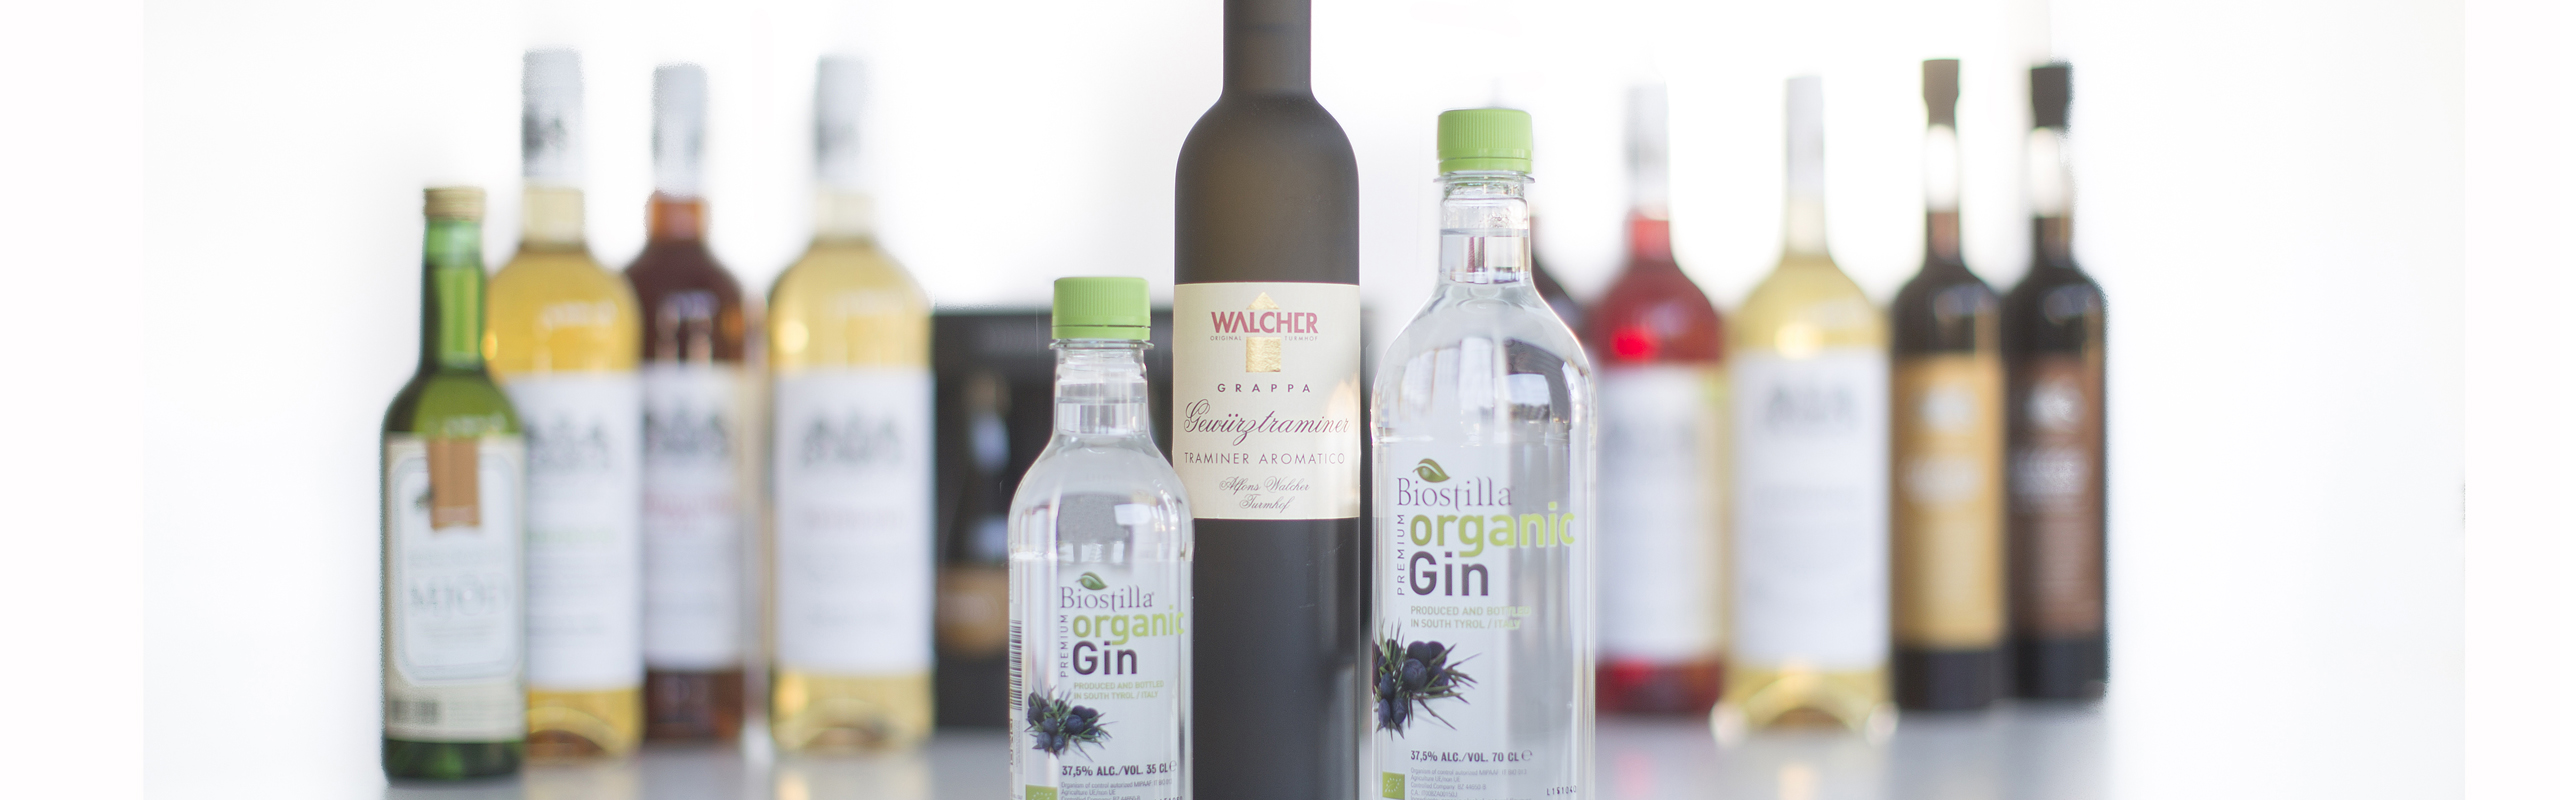 Gin-Grappa-web1